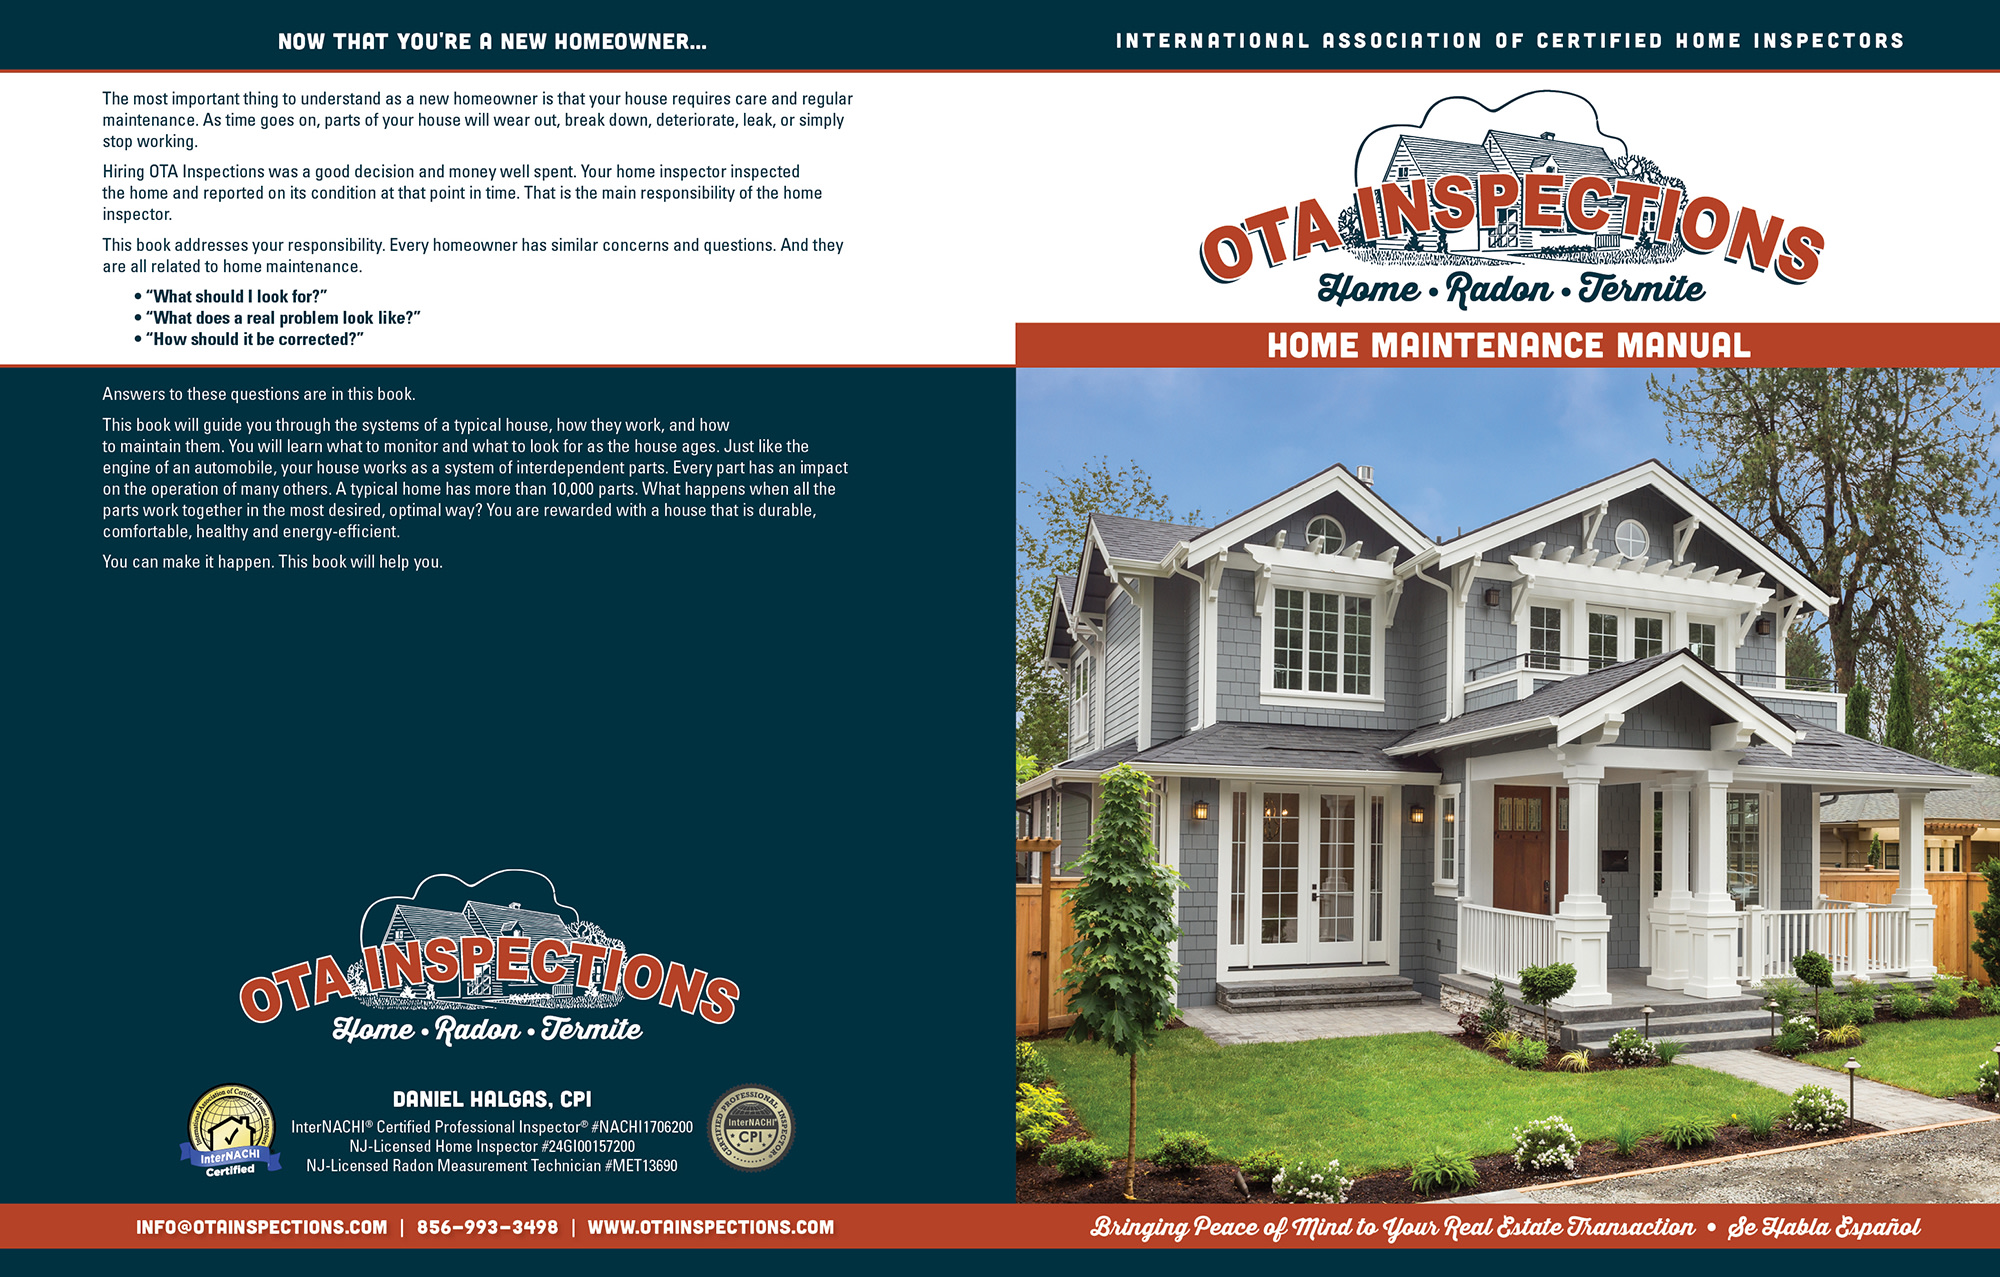 Custom Home Maintenance Book for OTA Inspections